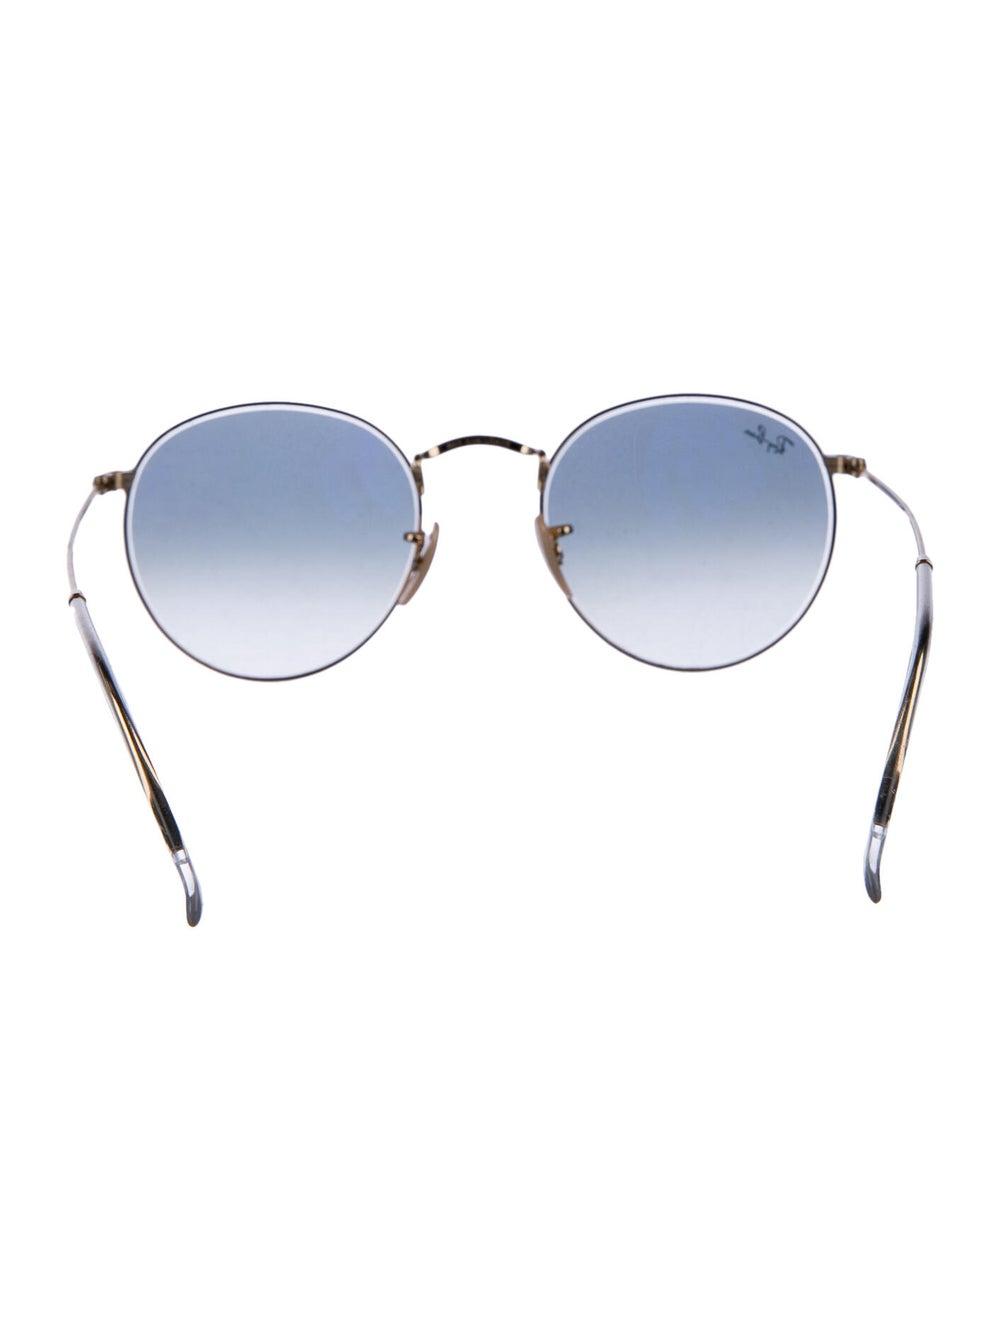 Ray-Ban Round Metal Round Sunglasses Gold - image 3